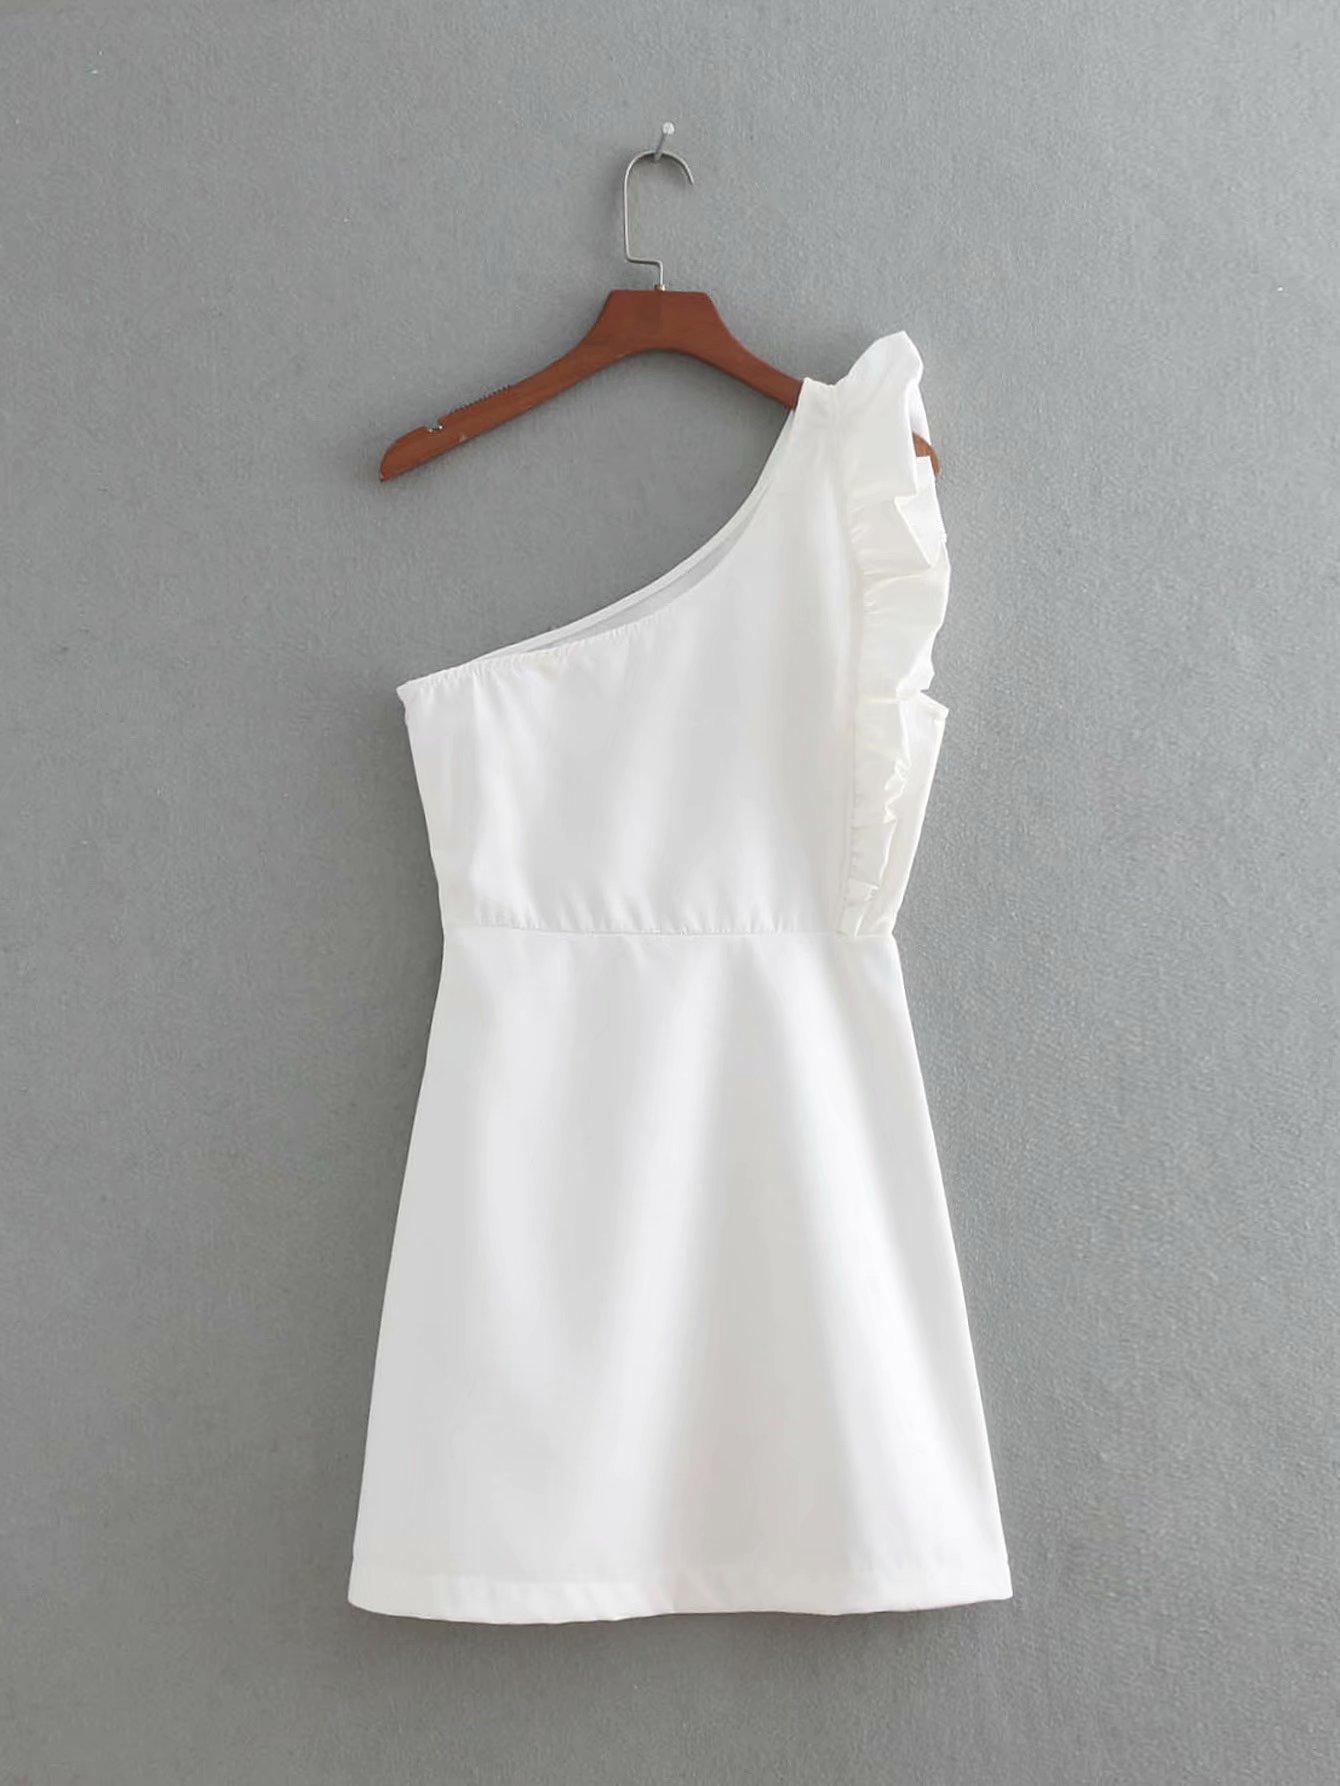 Polyester Fashionskirt(Black-S) NHAM4400-Black-S